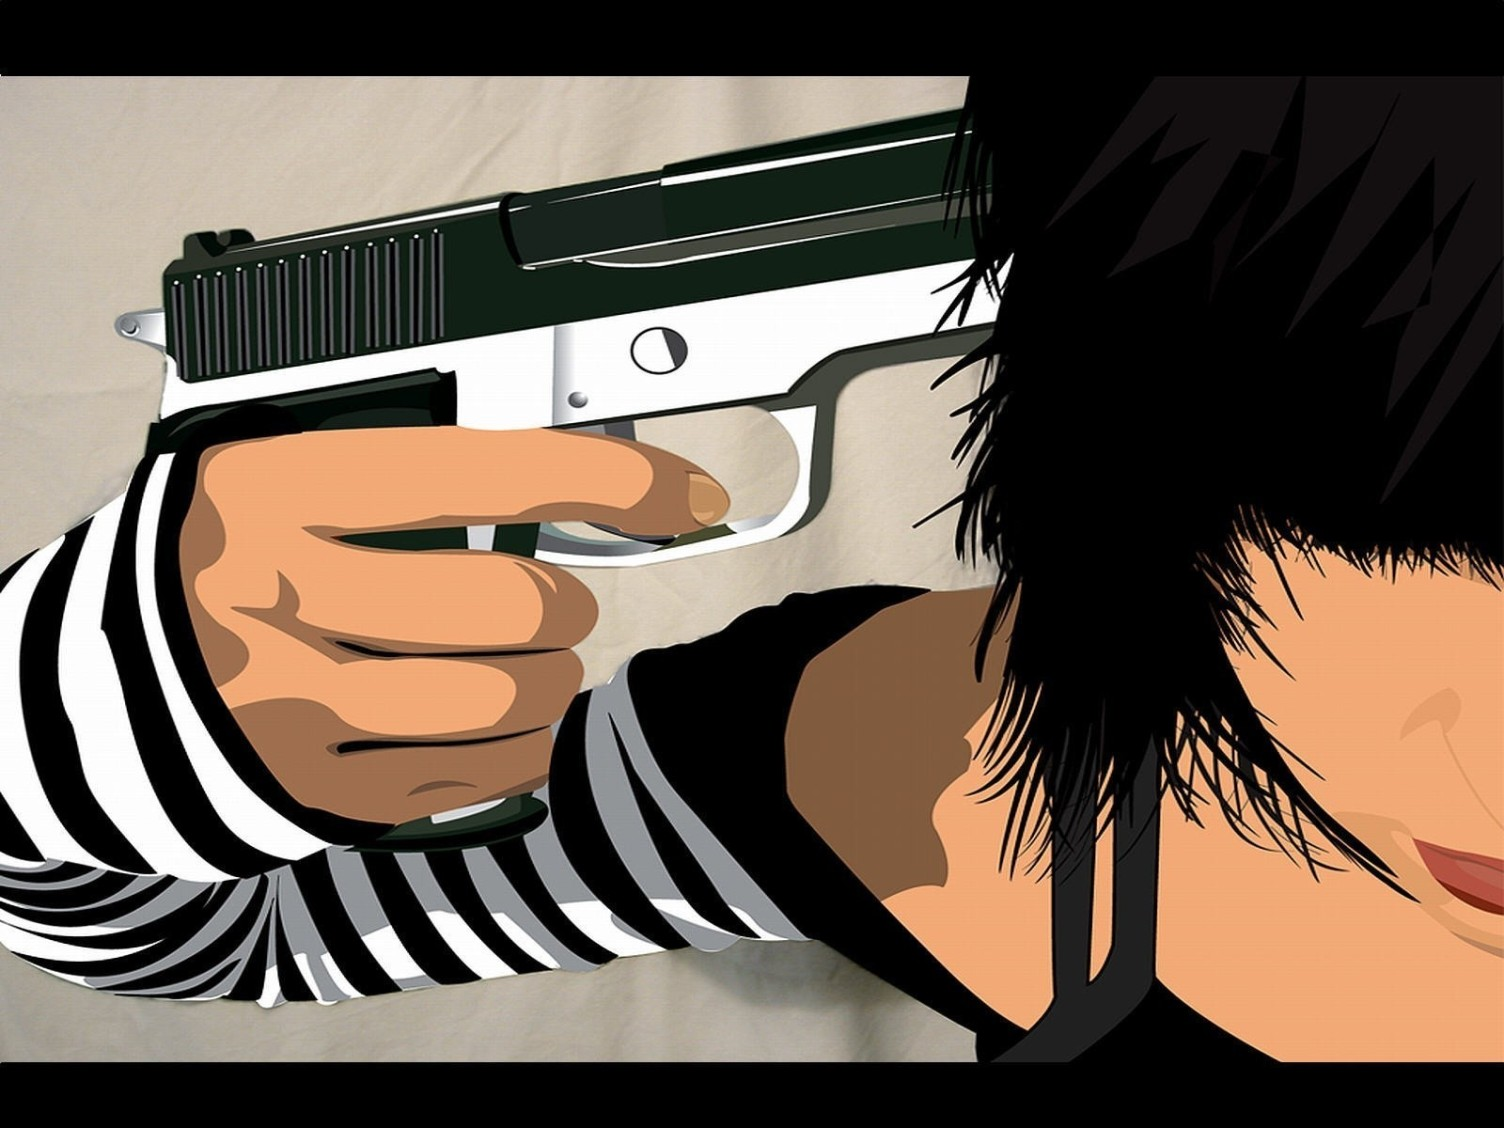 http://1.bp.blogspot.com/-OKBCmbjDtns/Twyz_6EFaVI/AAAAAAAAciM/pF7tL8GefDA/s1600/Guns+Wallpaper+2012+%252817%2529.jpg